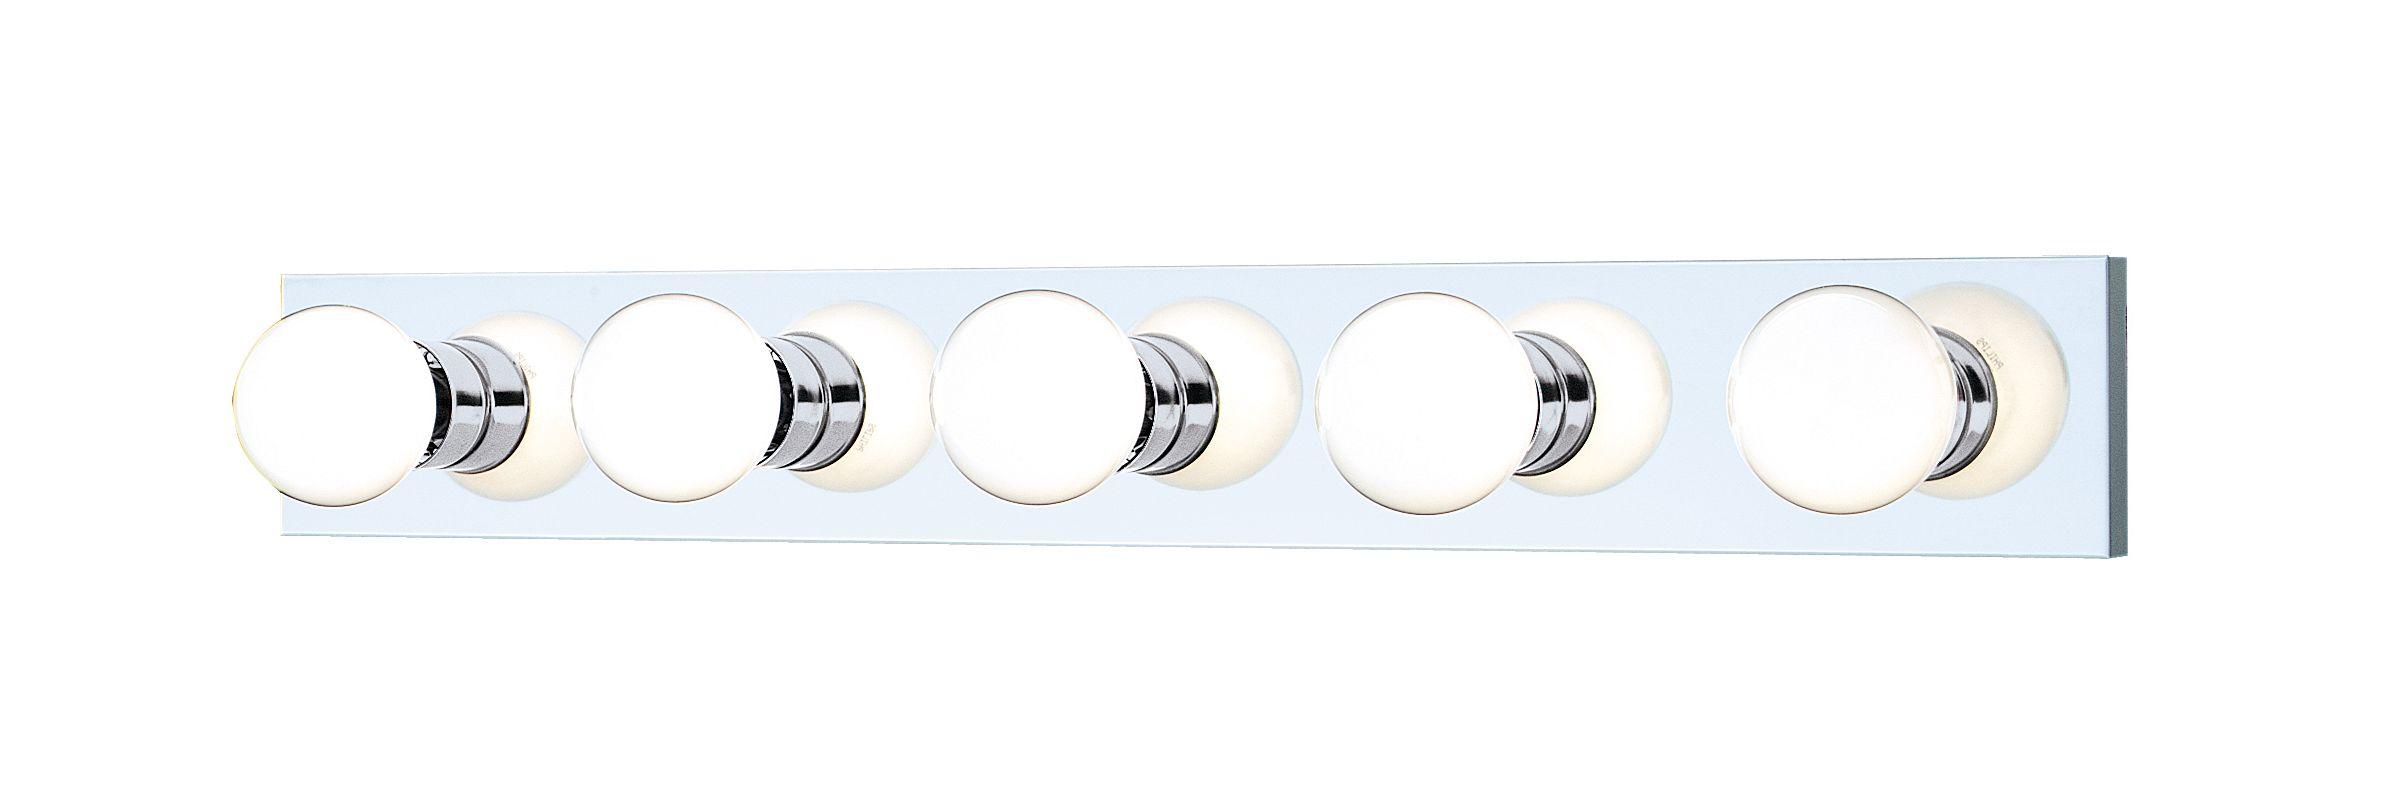 "Thomas Lighting SL7415 Functional 5 Light 30"" Wide Bathroom Fixture"